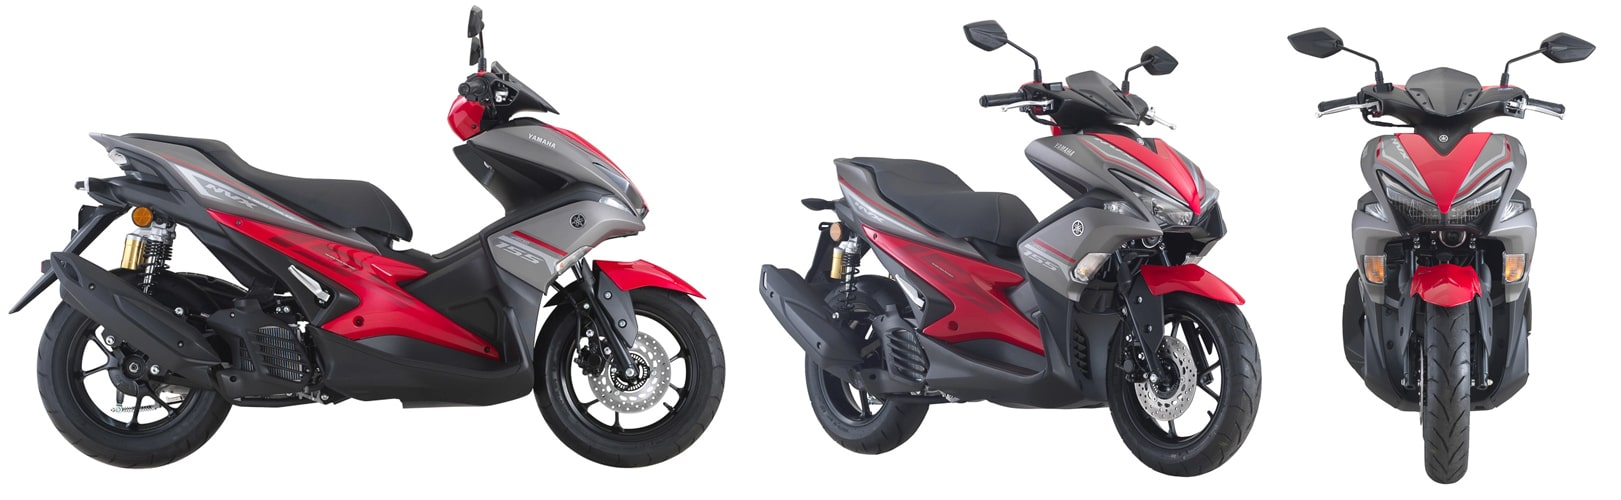 Yamaha Aerox 2020 สีแดง